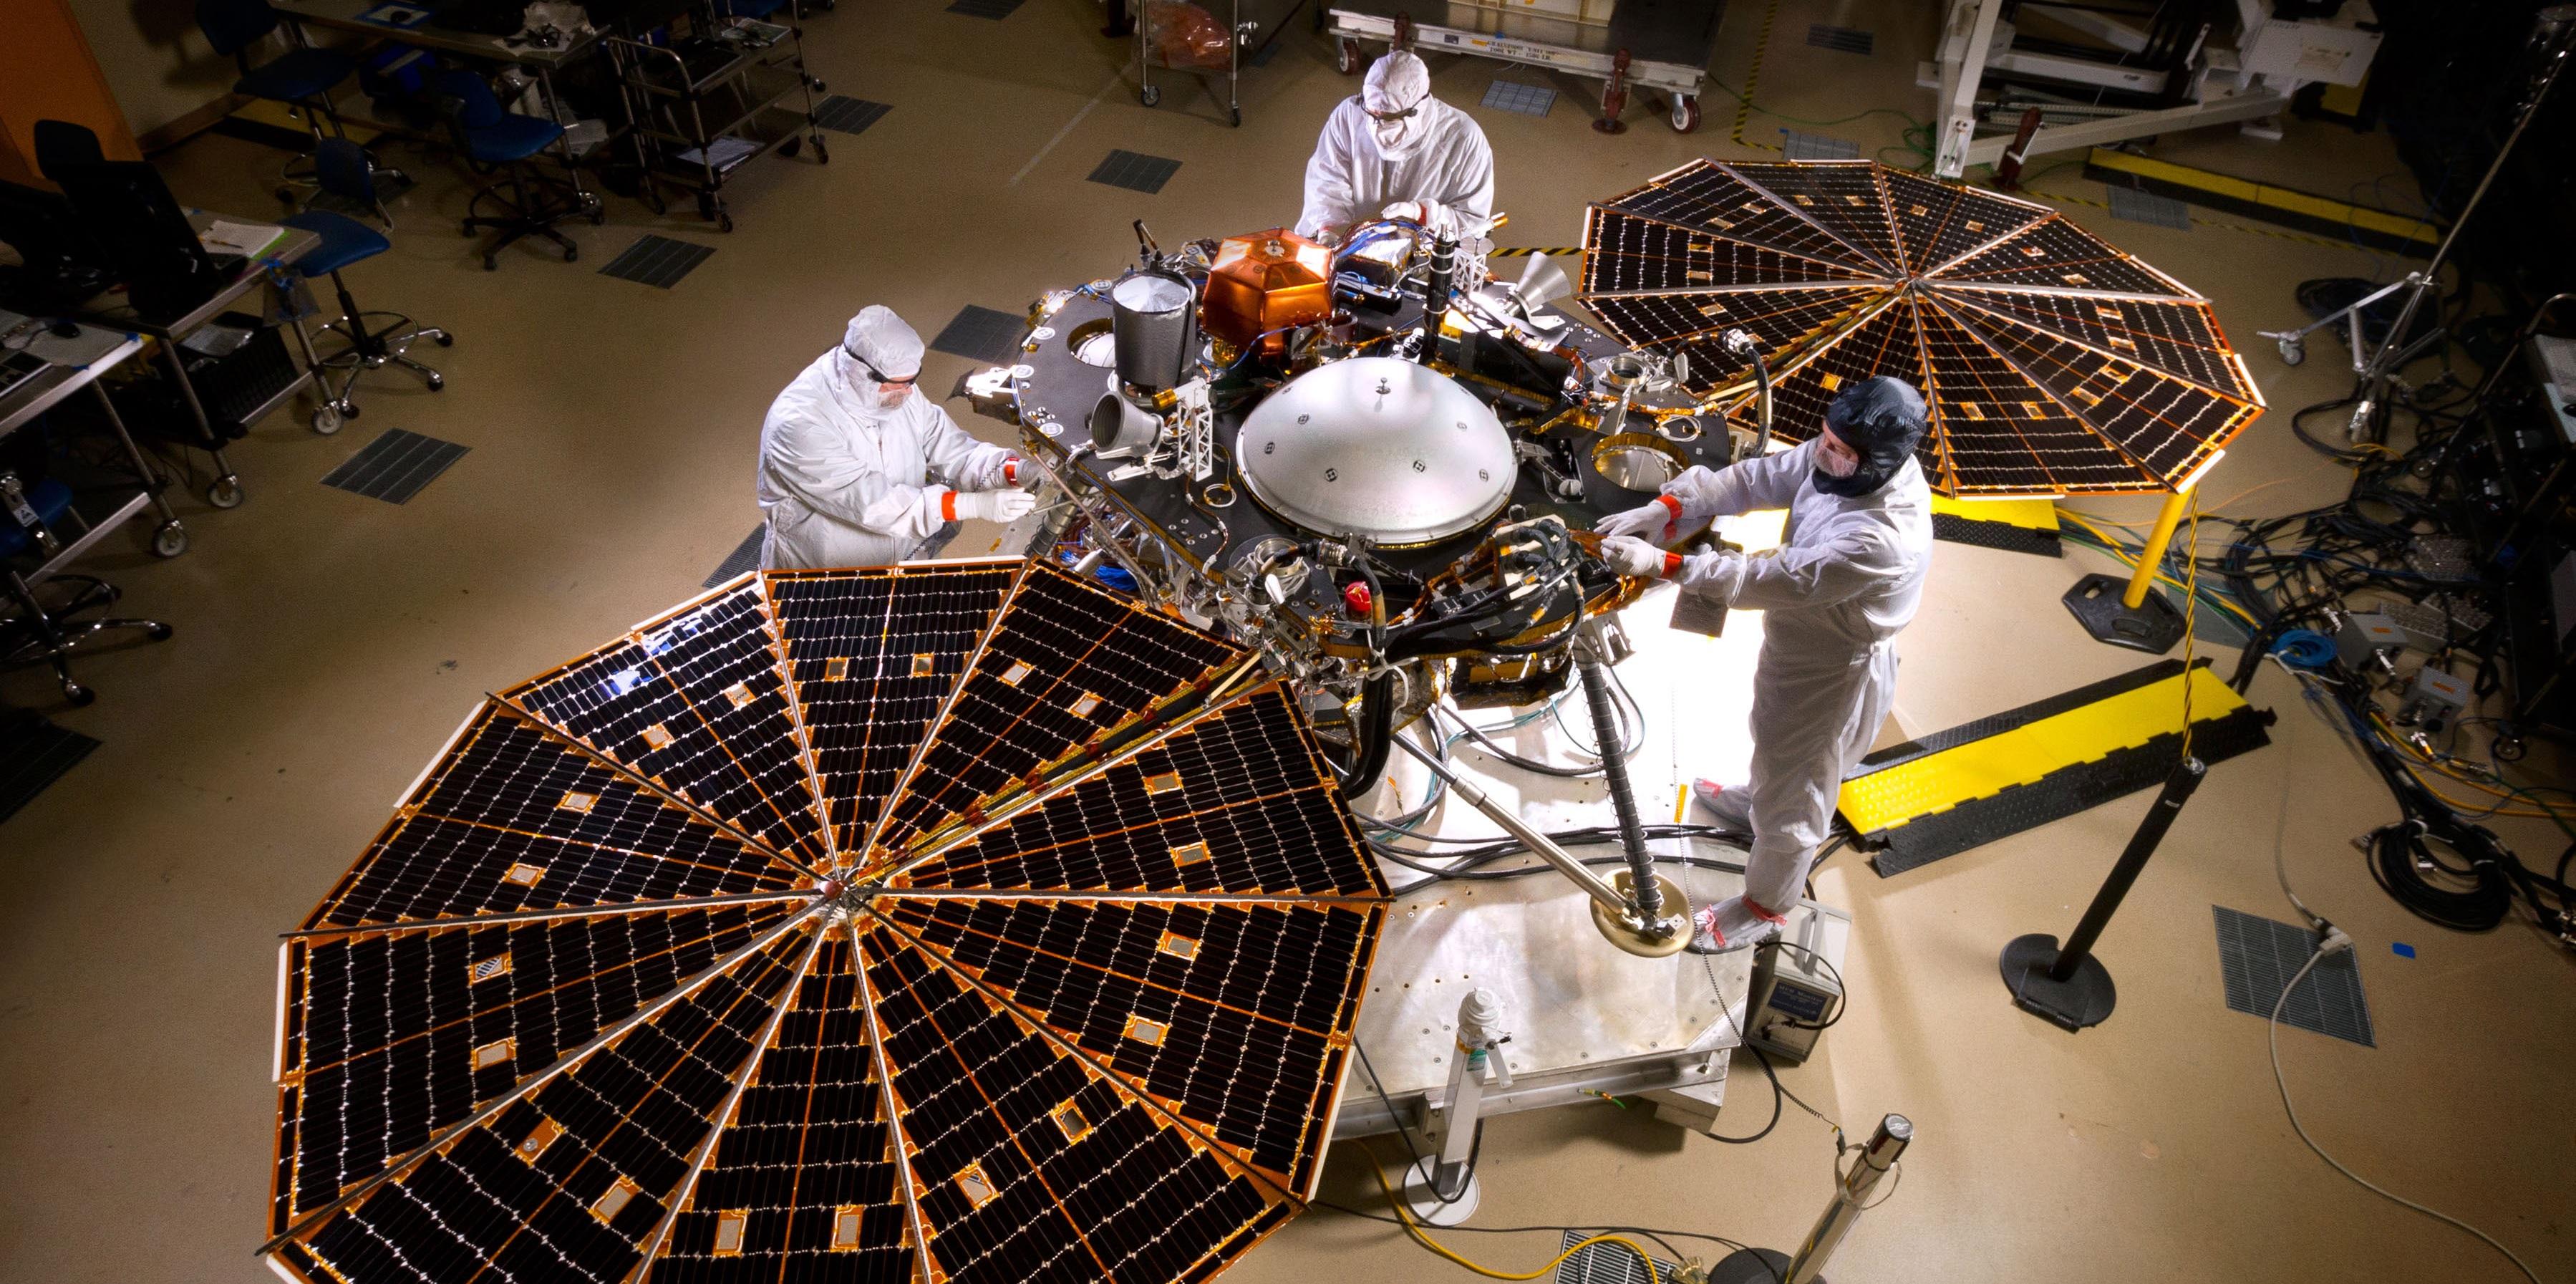 mars-insight-solar-panels-open-pia196641-full.jpg